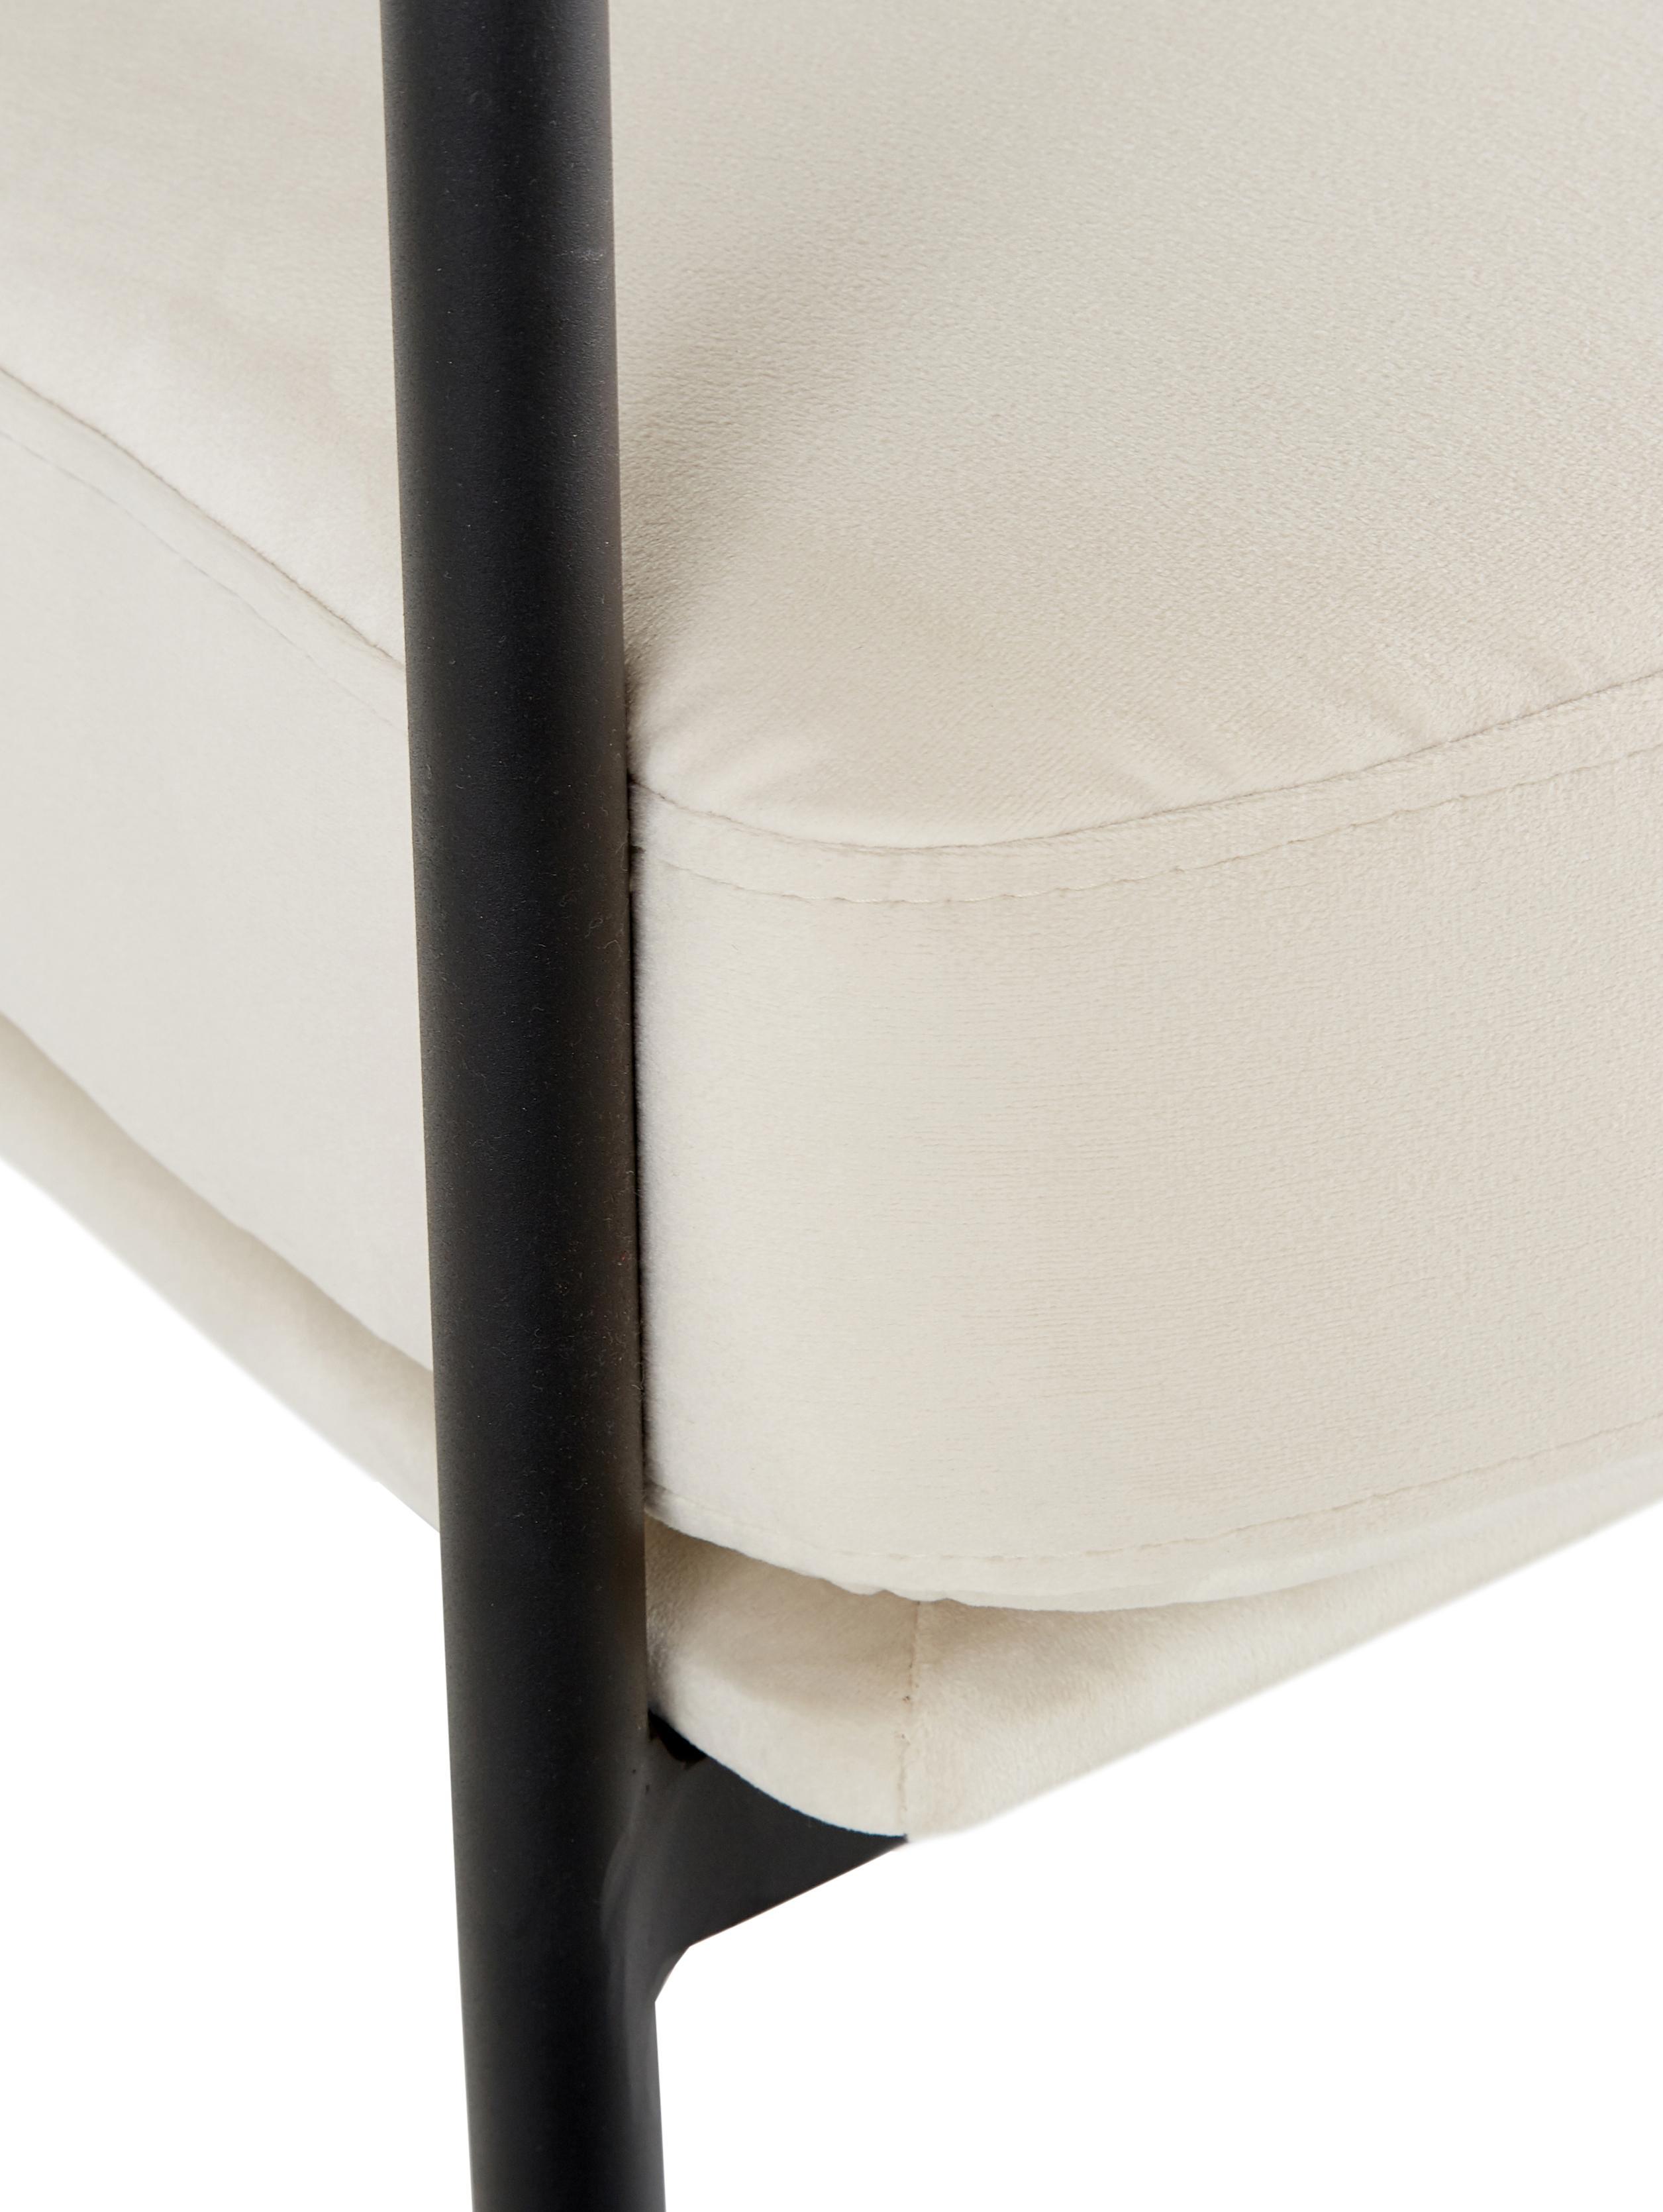 Samt-Loungesessel Zoe, Bezug: Samt (Polyester) 50.000 S, Gestell: Metall, pulverbeschichtet, Teddy Cremeweiß, B 67 x T 66 cm